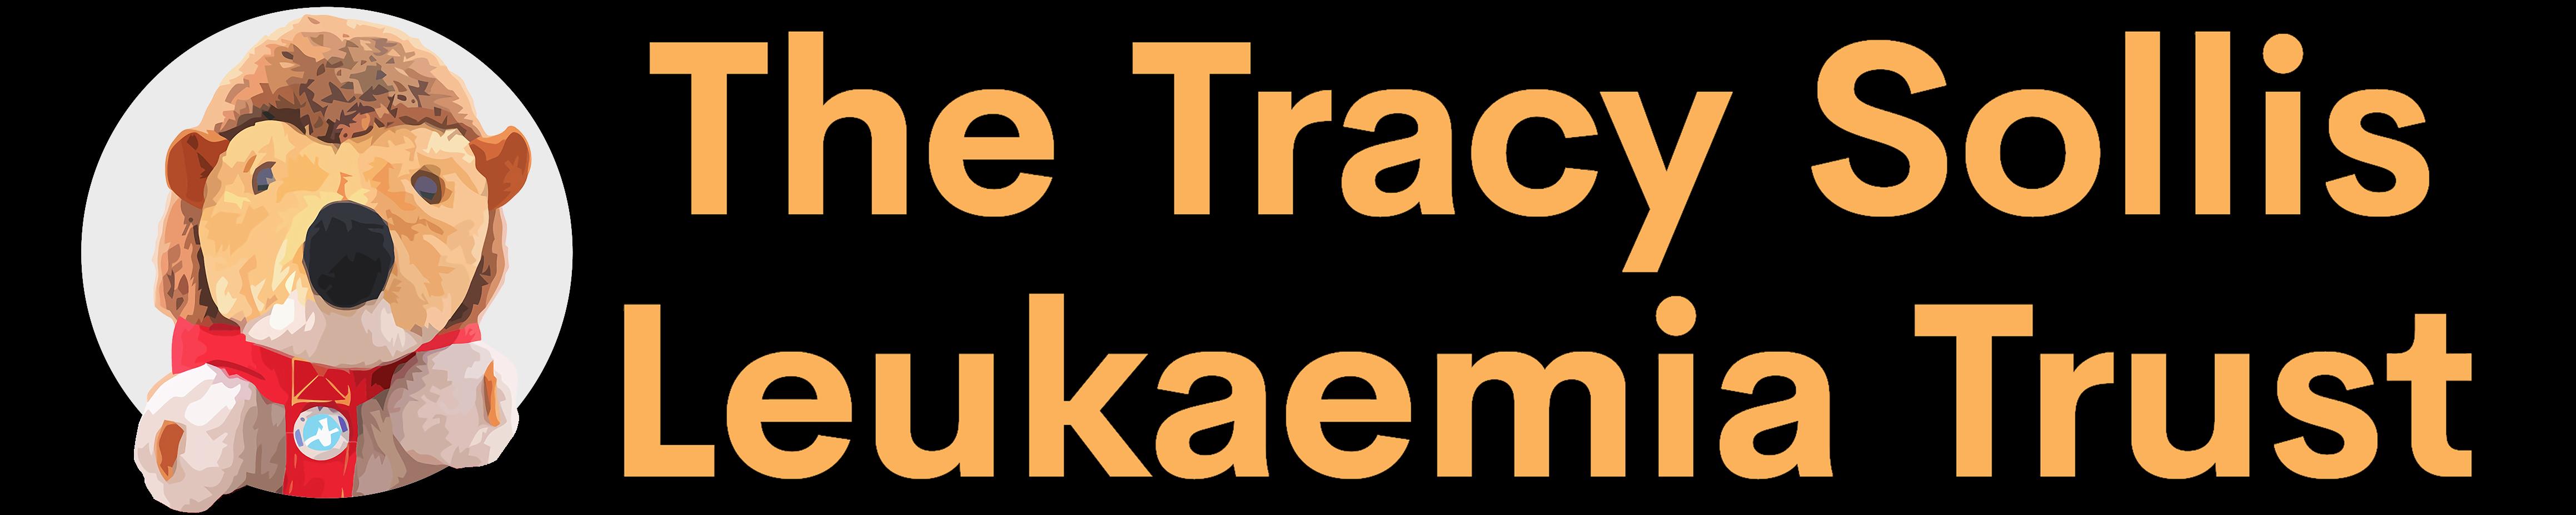 The Tracy Sollis Leukaemia Trust